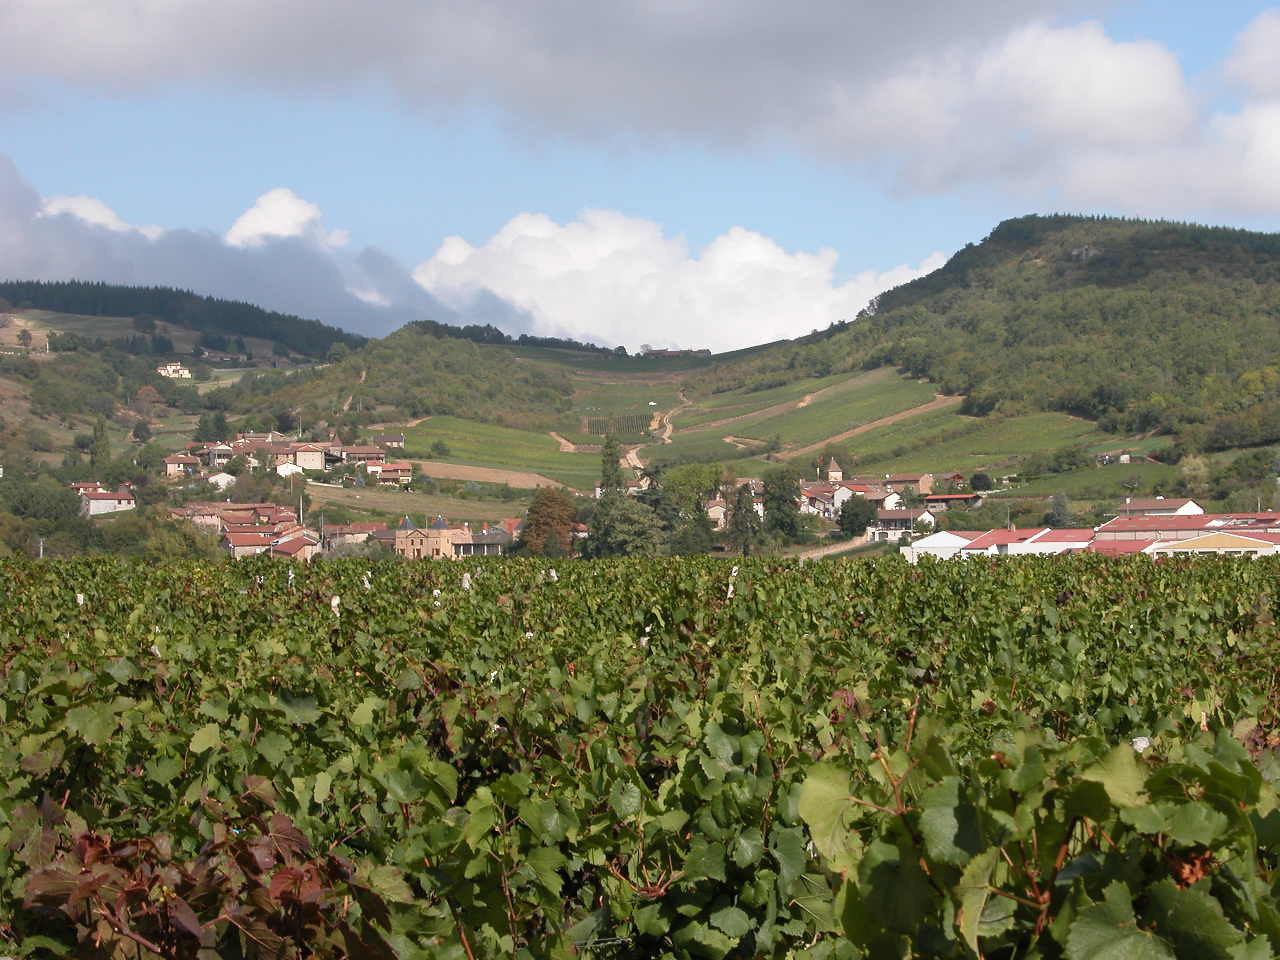 Vineyards in central France - around Macon - day 6